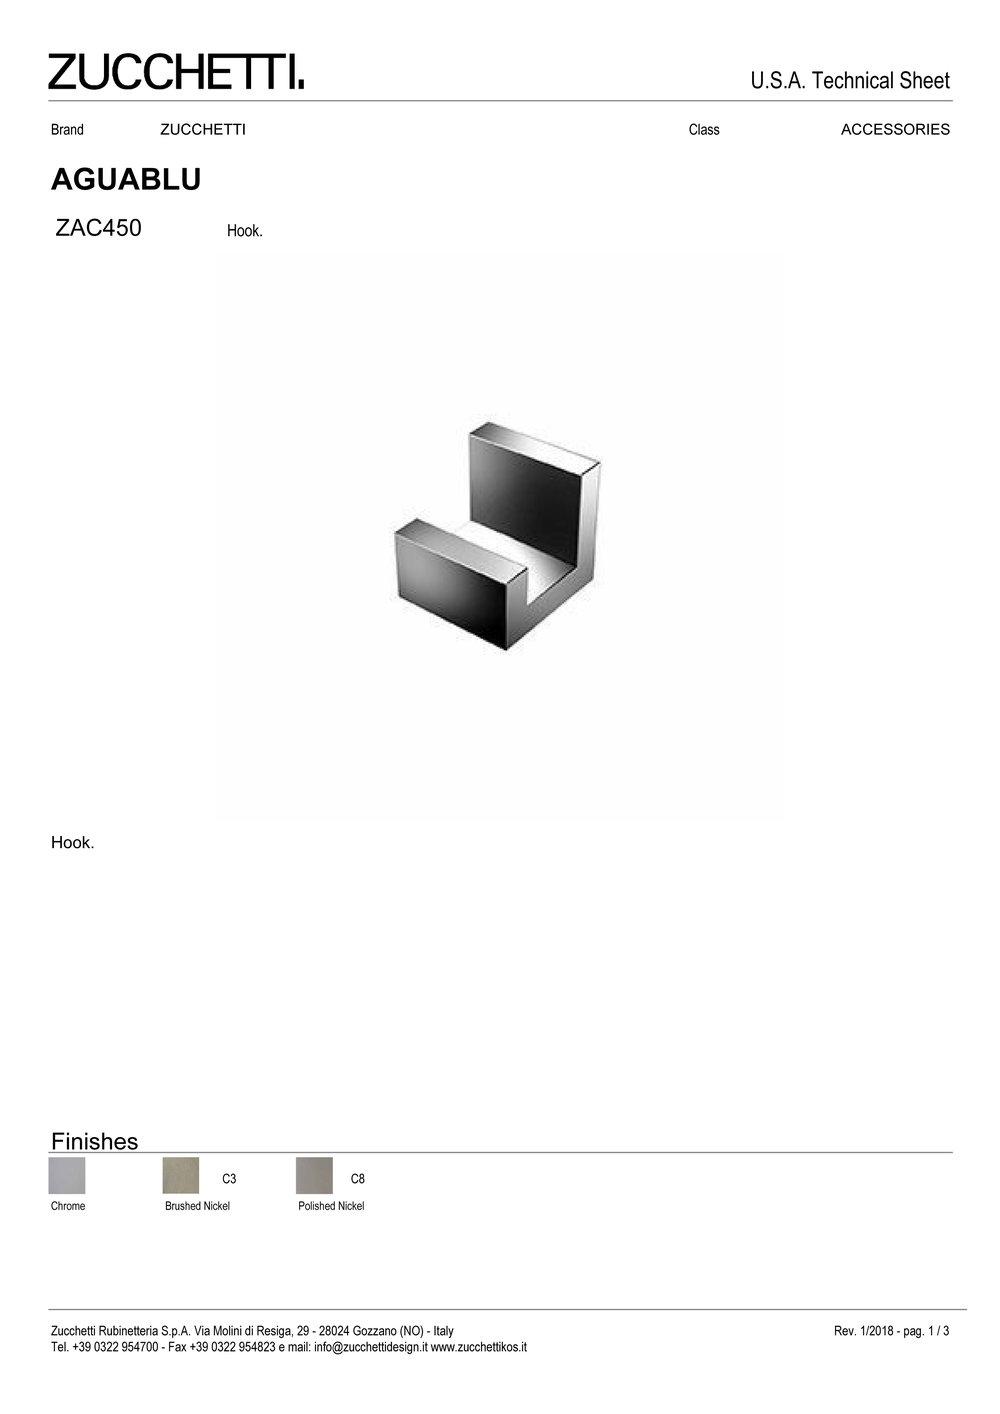 Zuchetti Aquablu robe hook, 3,9 w x 3,9 h, PC-1.jpg